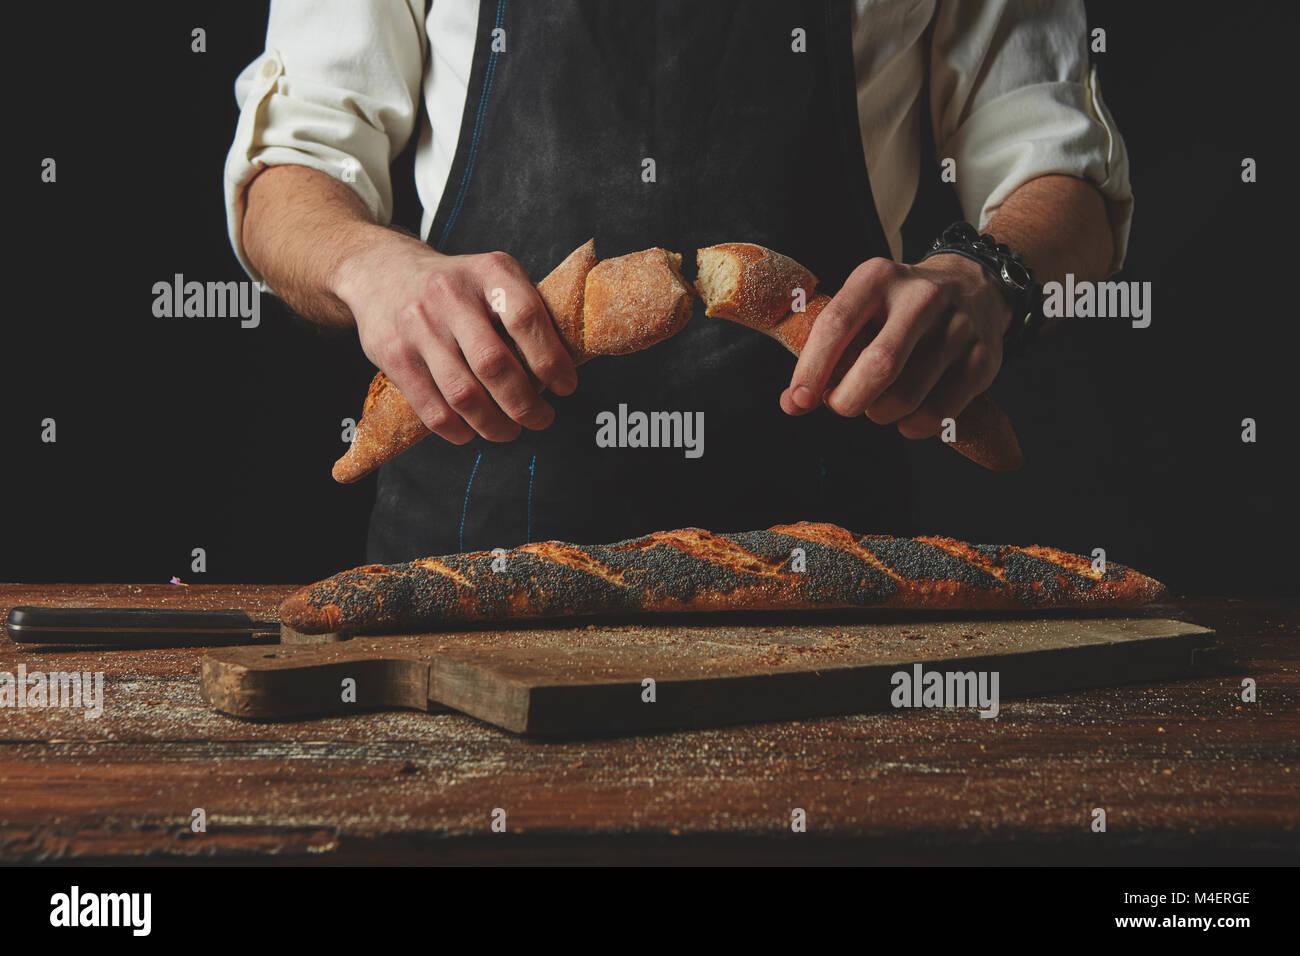 Hand breaks baguette - Stock Image